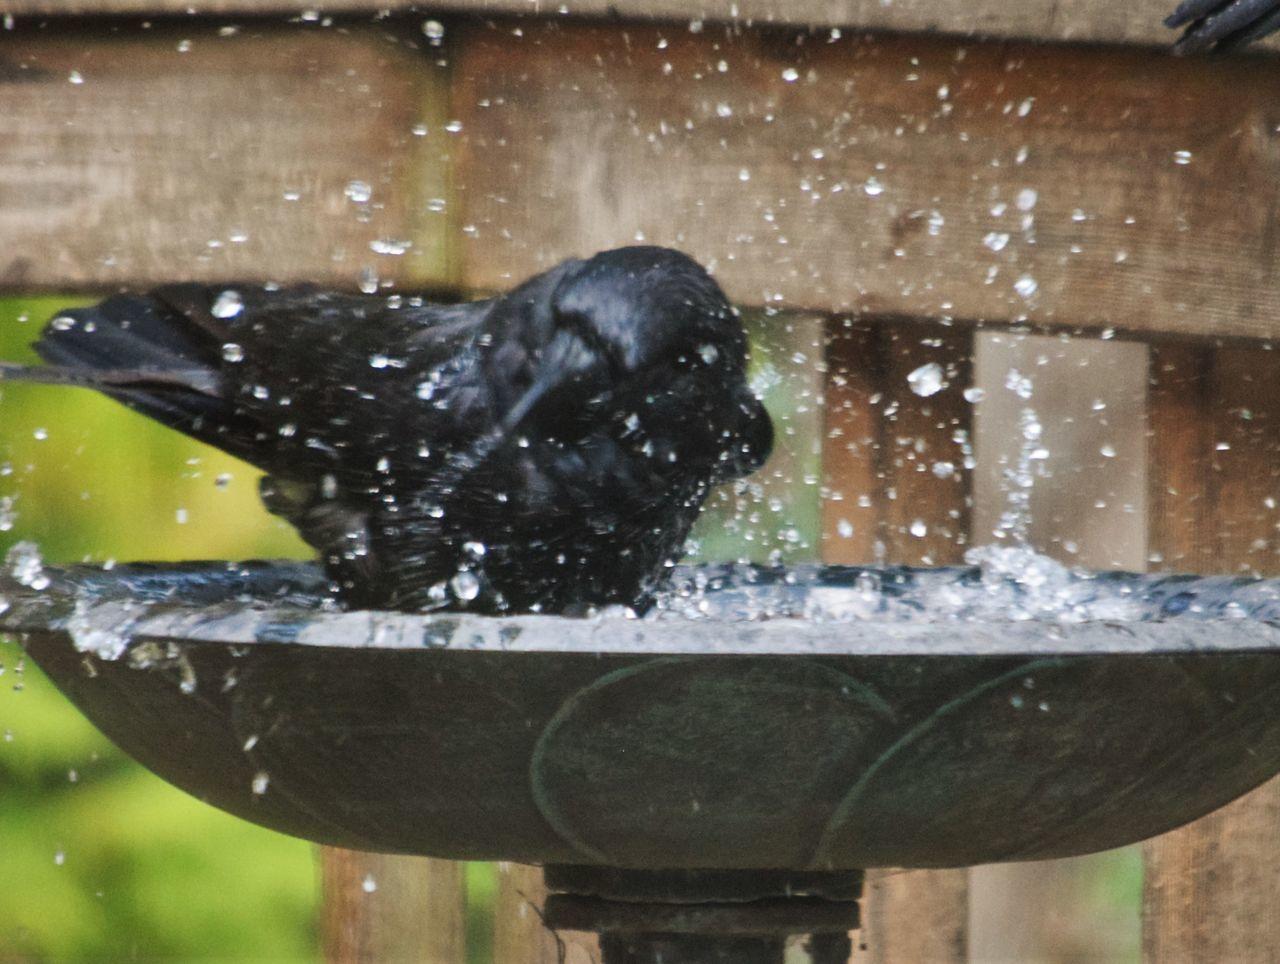 CLOSE-UP OF WET BIRD IN WATER